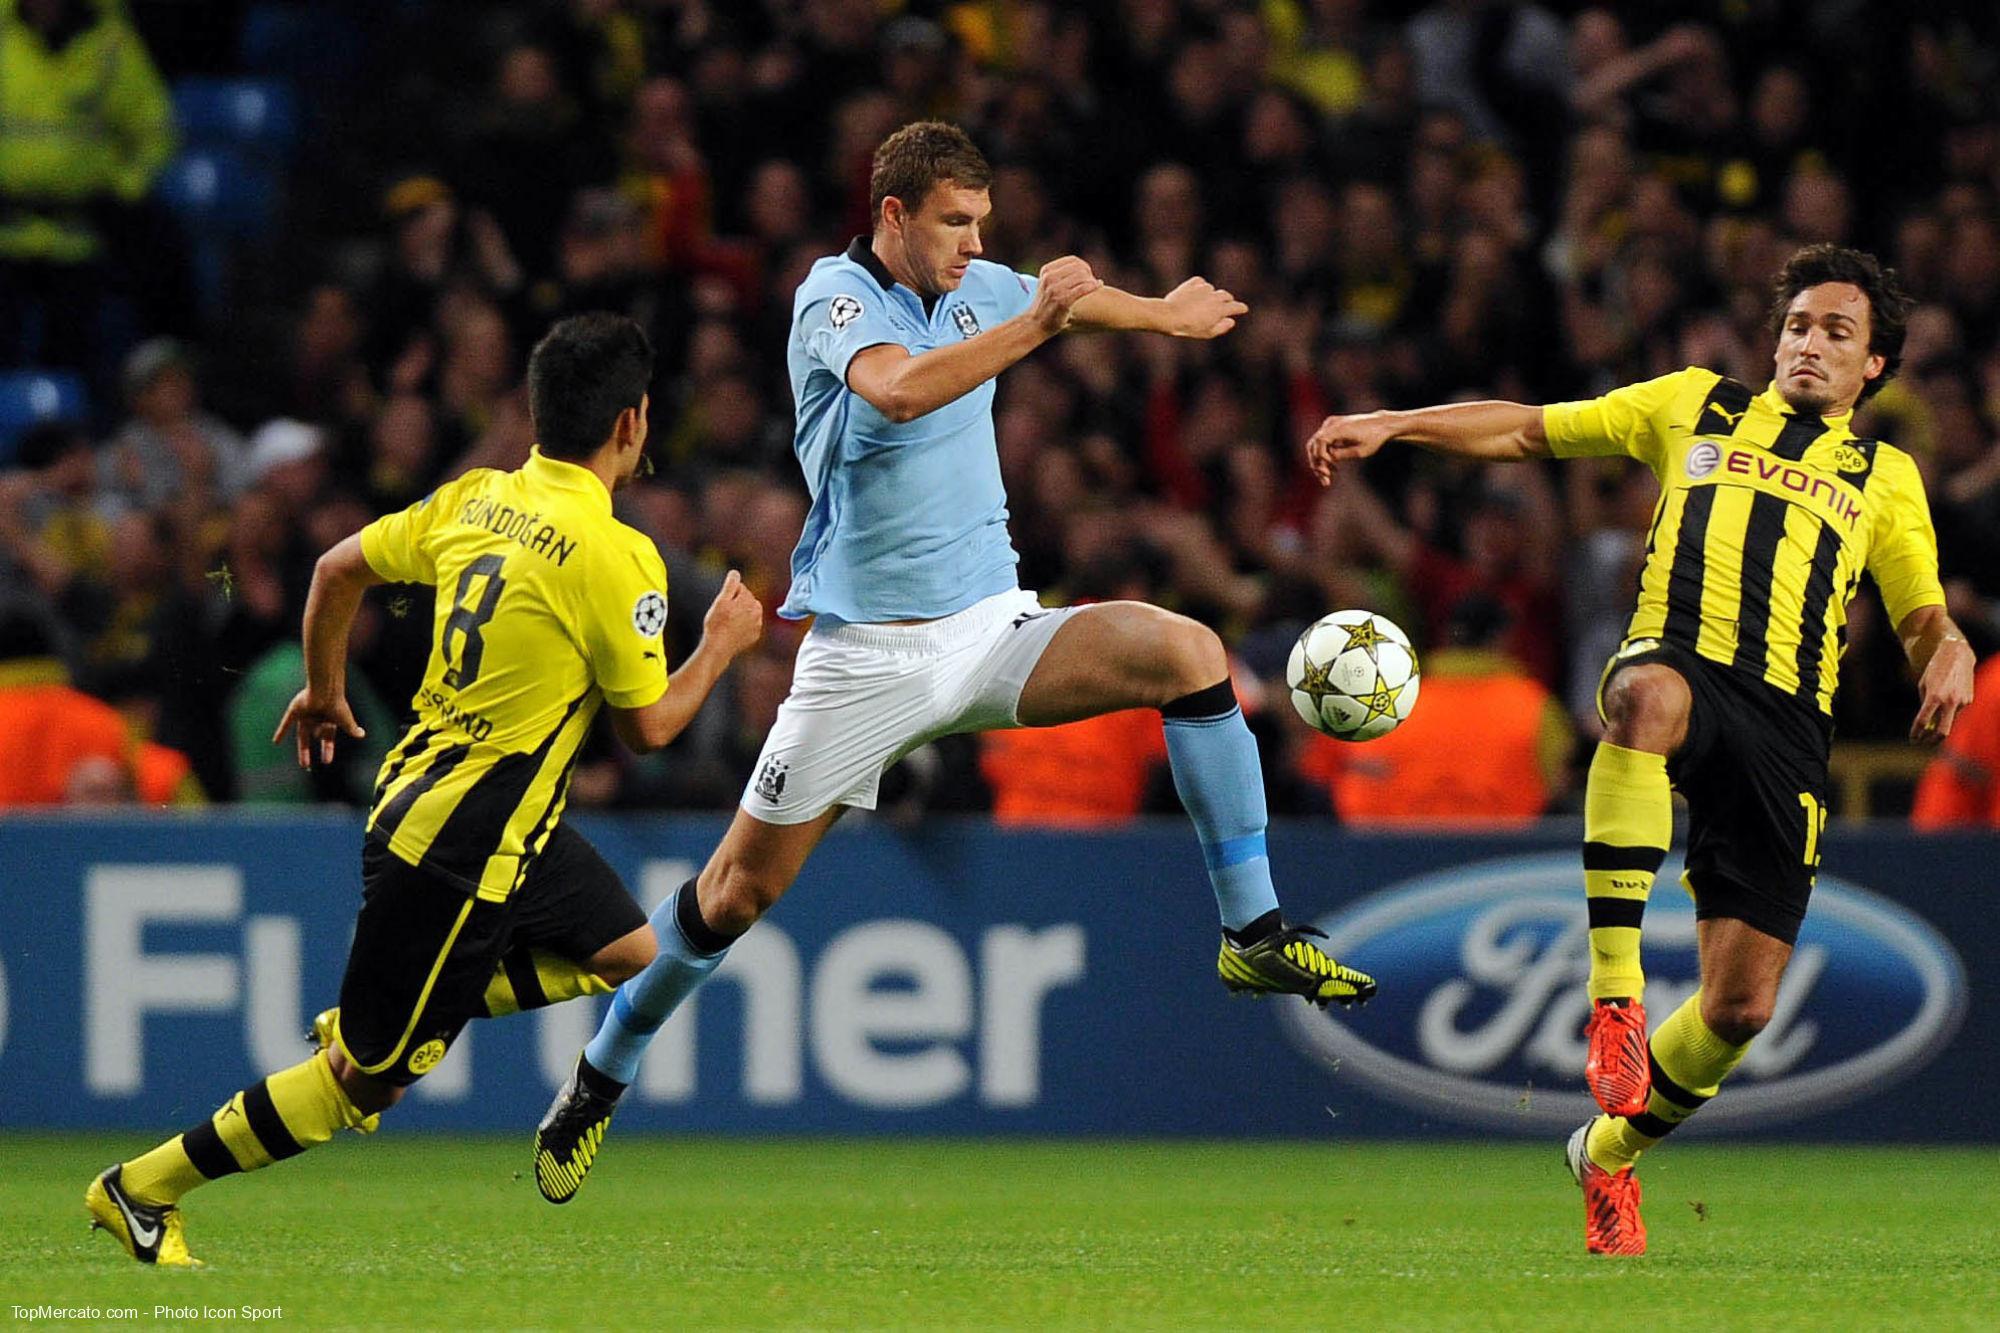 Mats Hummels, Edin Dzeko, Manchester City - Borussia Dortmund